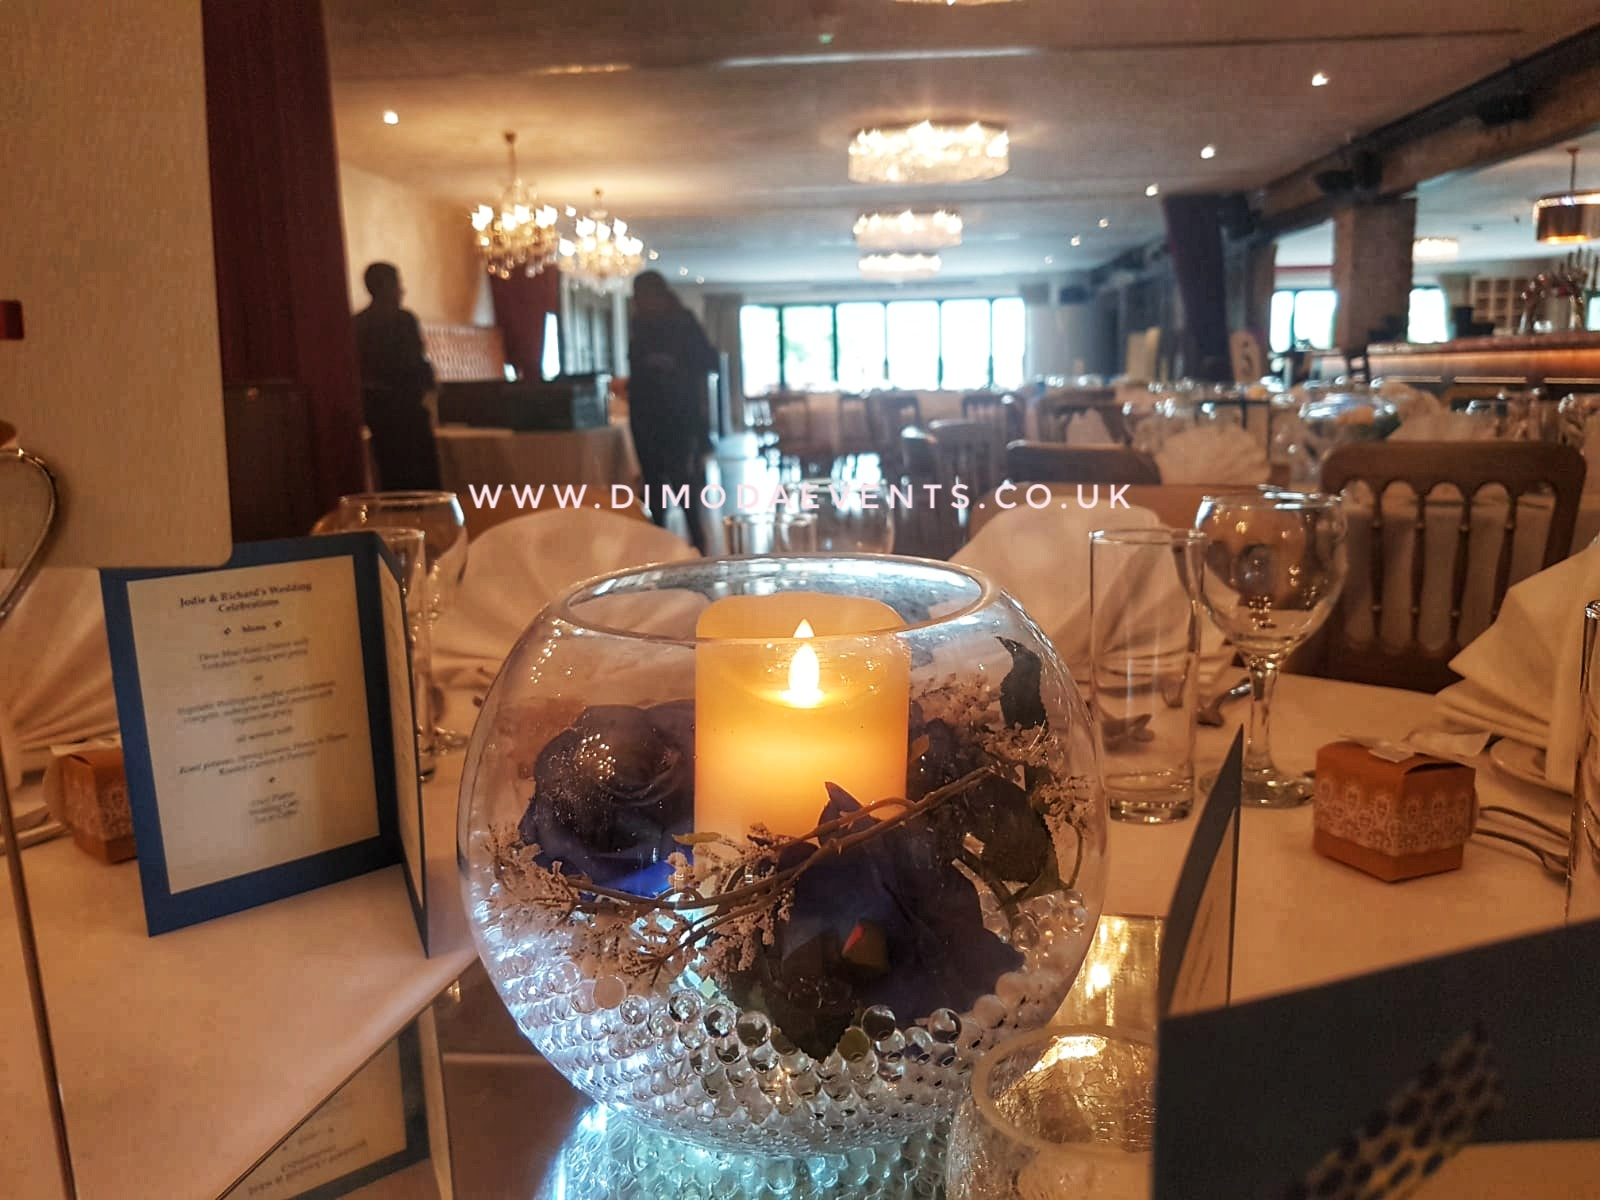 Fishbowl blue rose pillar